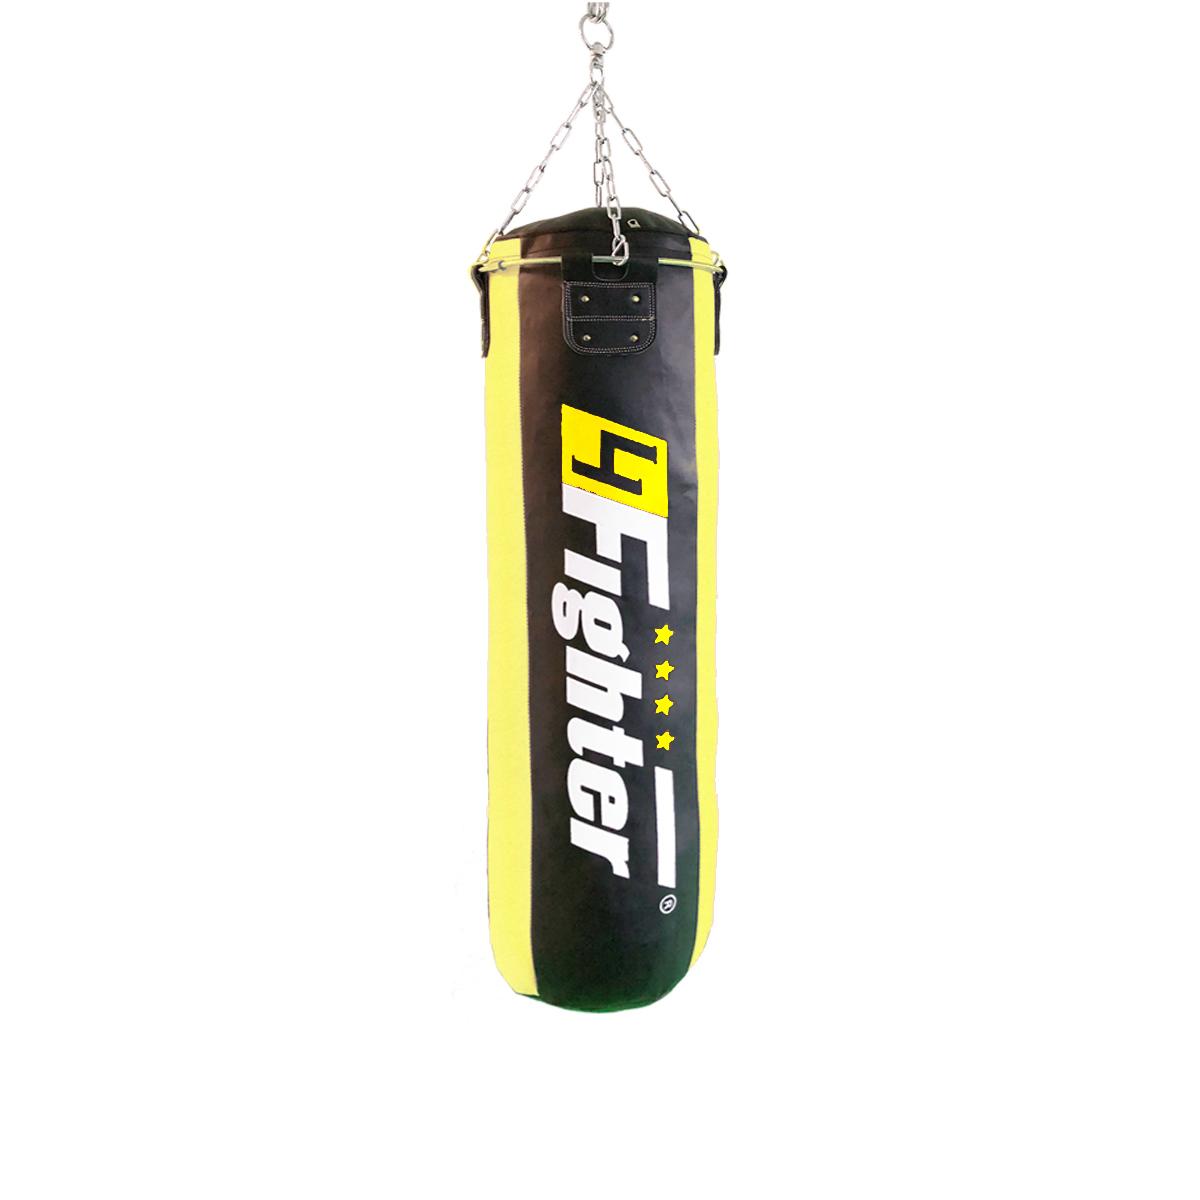 4Fighter Profi Kunstleder Boxsack / Sandsack - schwarz/gelb, ungefüllt 180cm